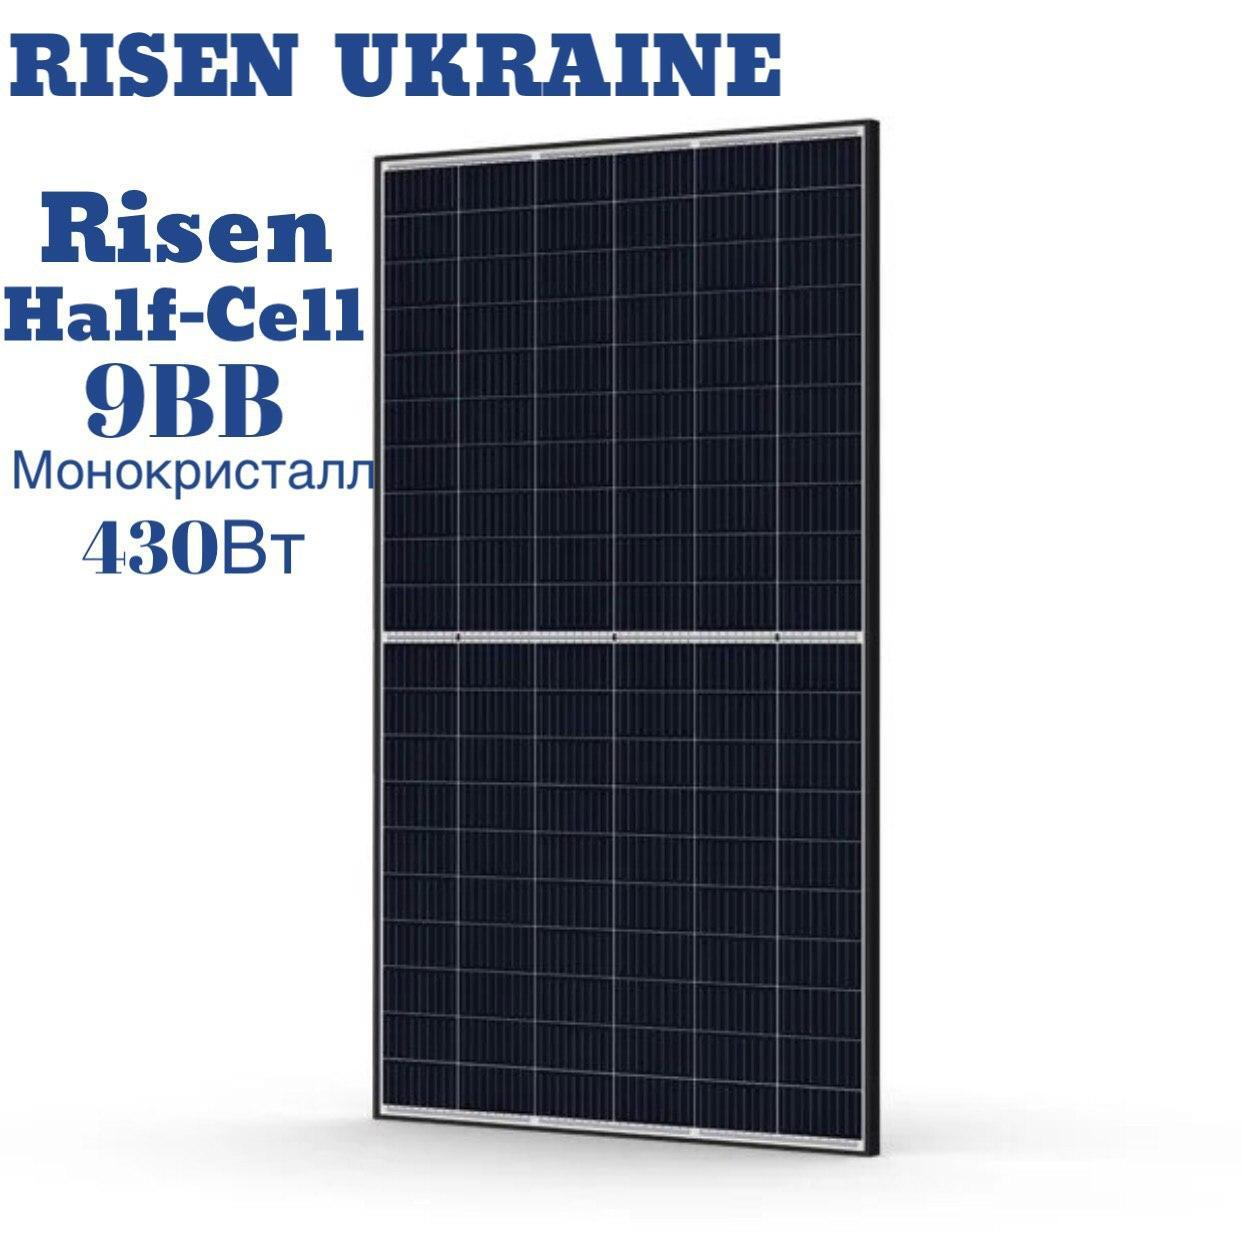 Солнечная батарея Risen 430М-156 монокристалл430Вт